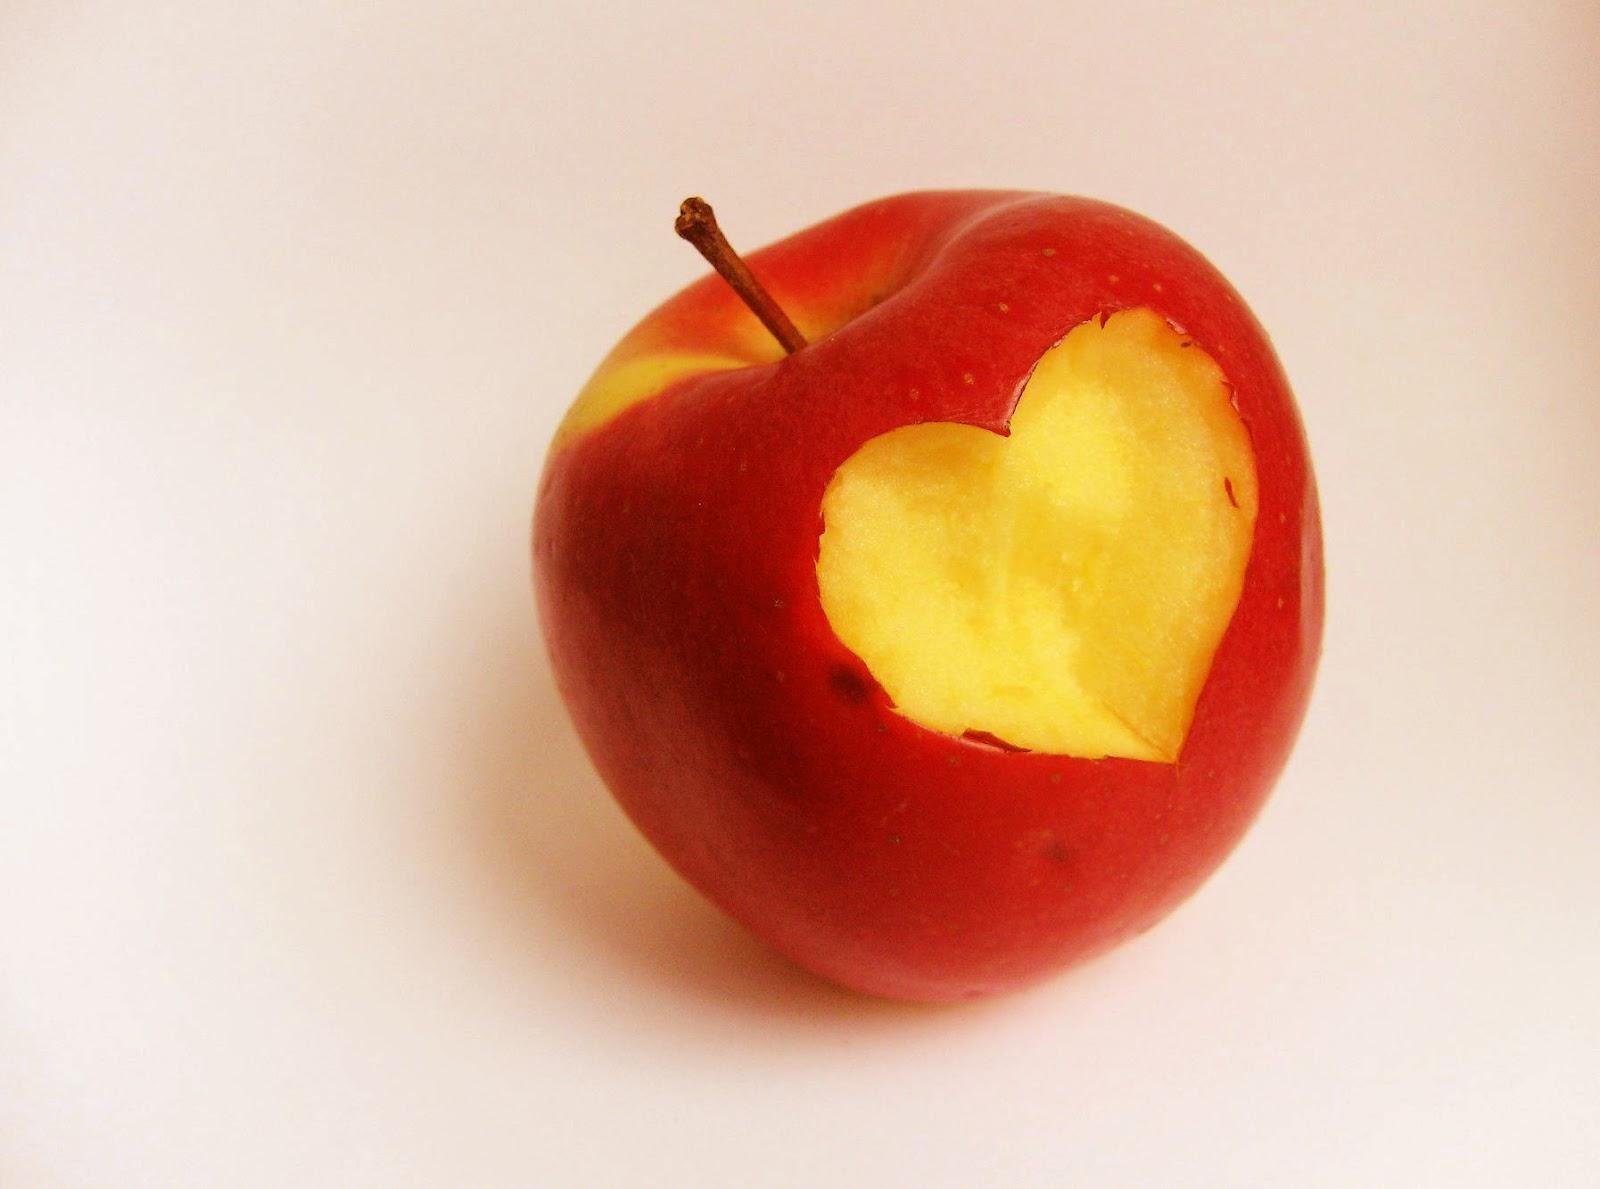 Fruit apple wallpaper - Fresh And Beautiful Apples Apples Images Apple Pics Apple Pictures Apple Wallpapers In Hd Fruit Wallpapers Fresh Fruit Wallpapers Fresh Apple Pics Green